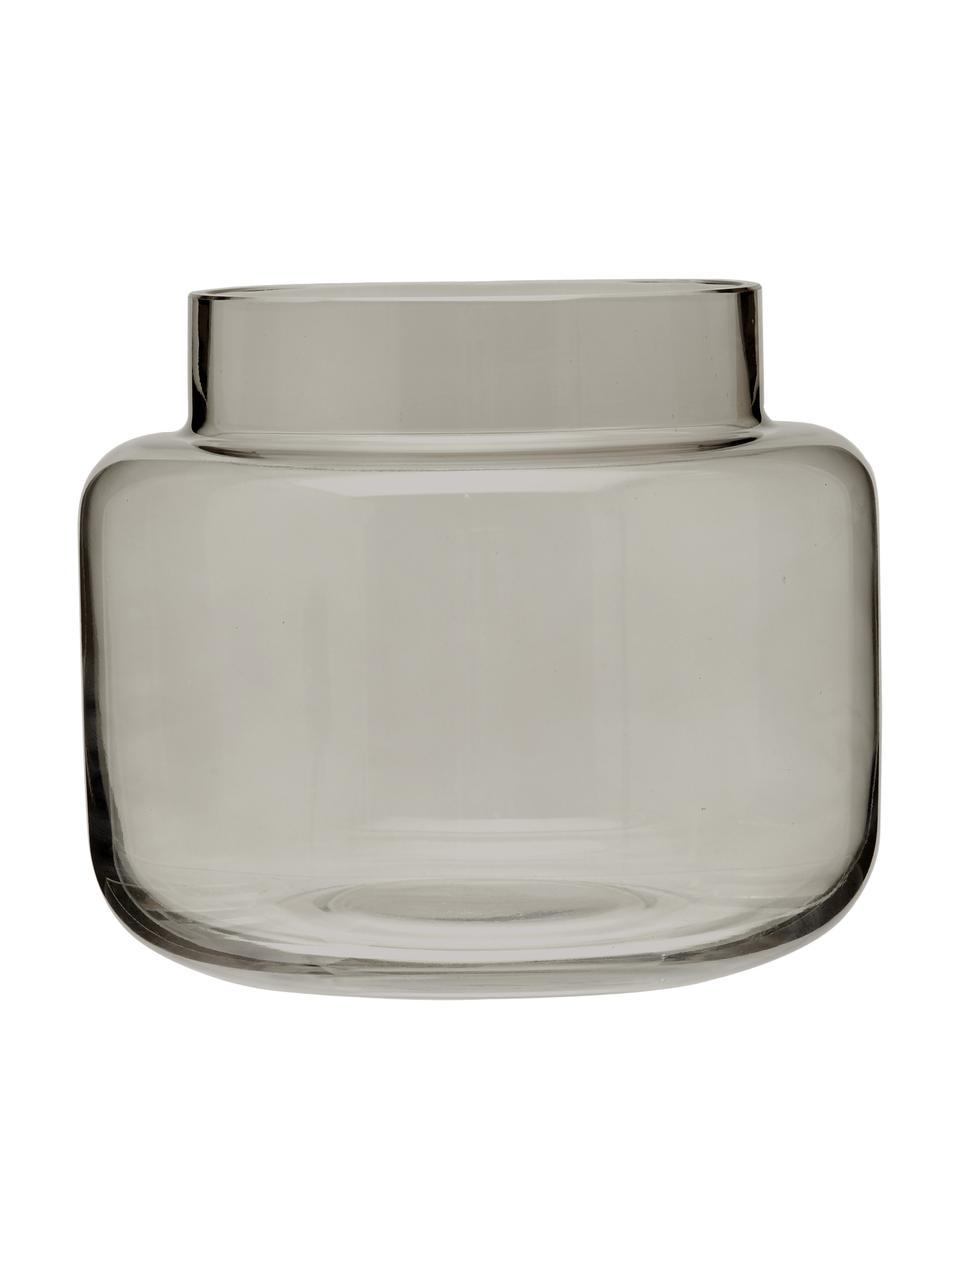 Glas-Vase Lasse, medium, Glas, Grau, transparent, Ø 16 x H 14 cm